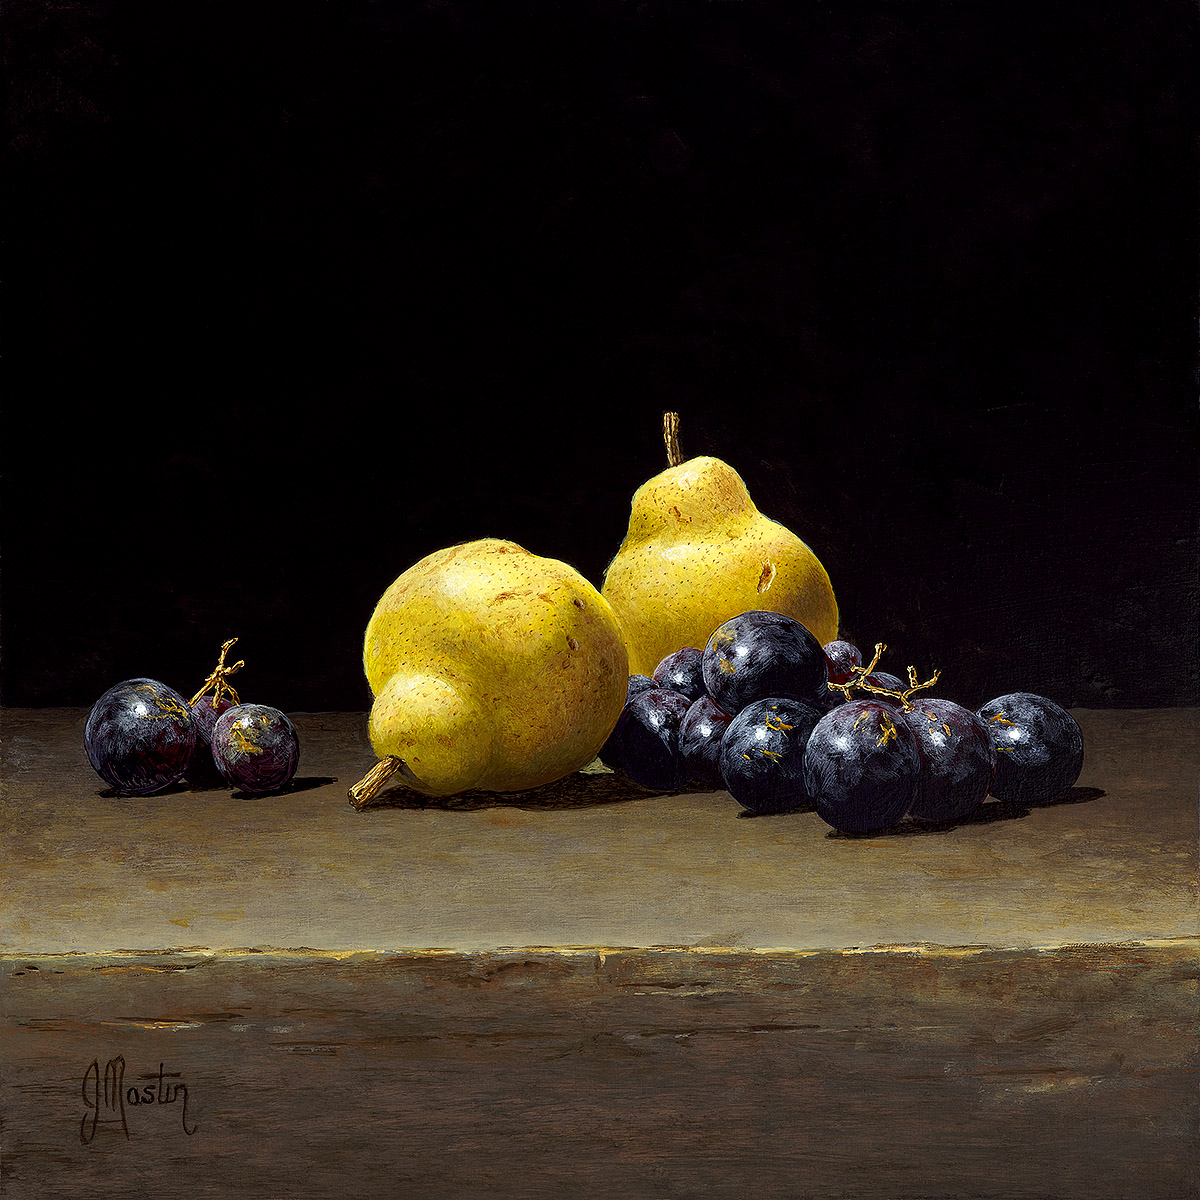 Ian Mastin, 'Still Life with Pears and Grapes', acrylic on board